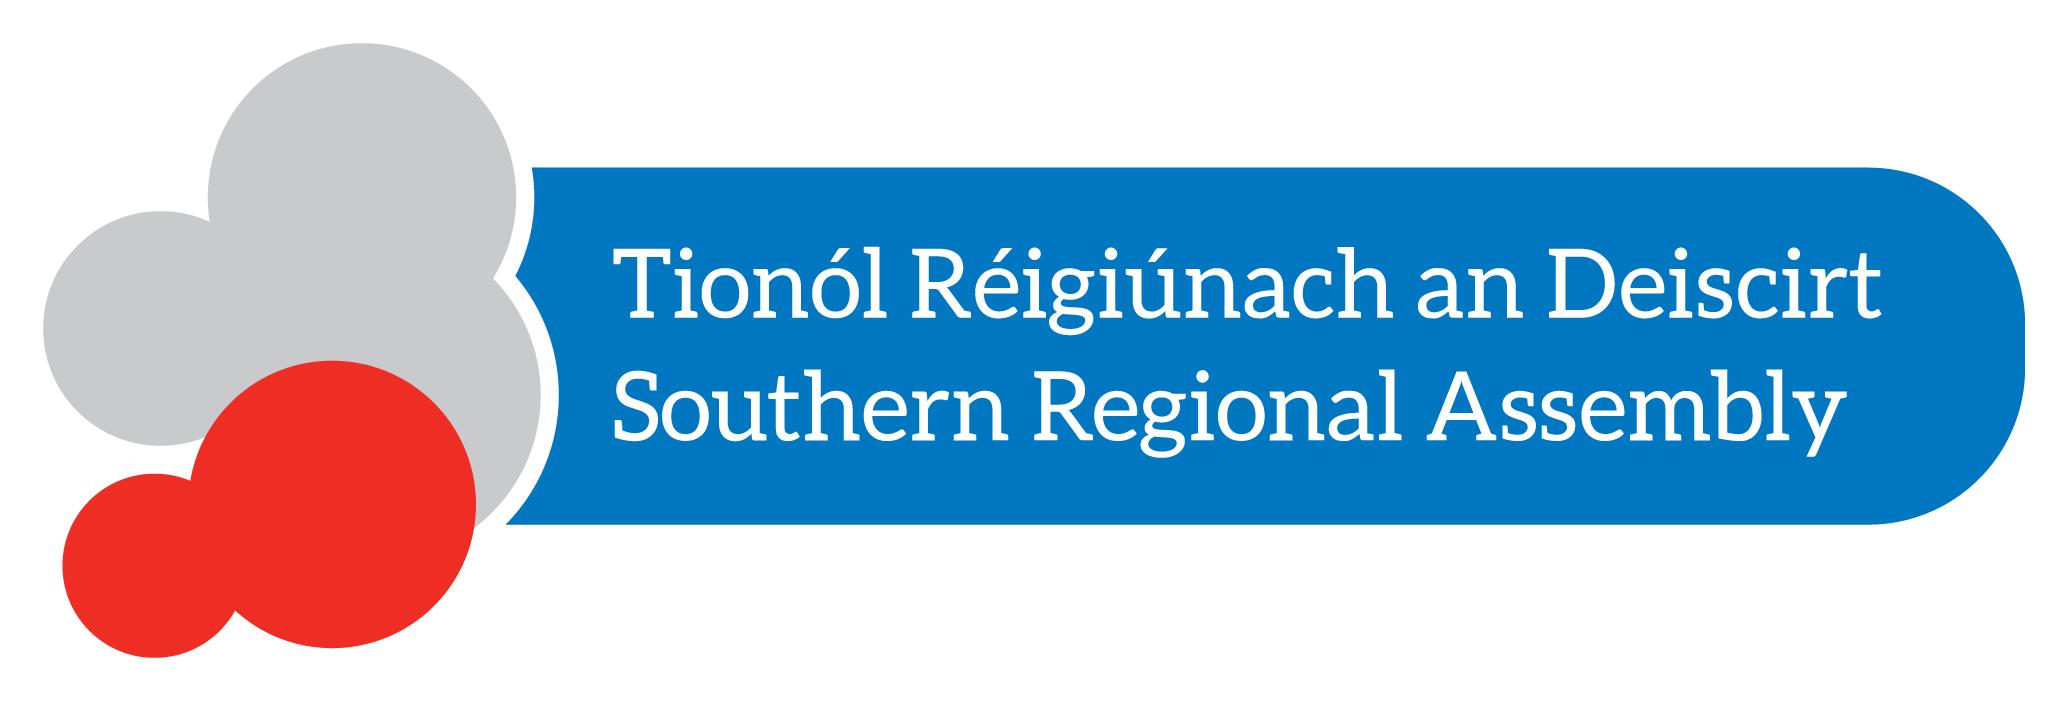 Southern-Regional-Assembly-Logo-Bilingual-lrg